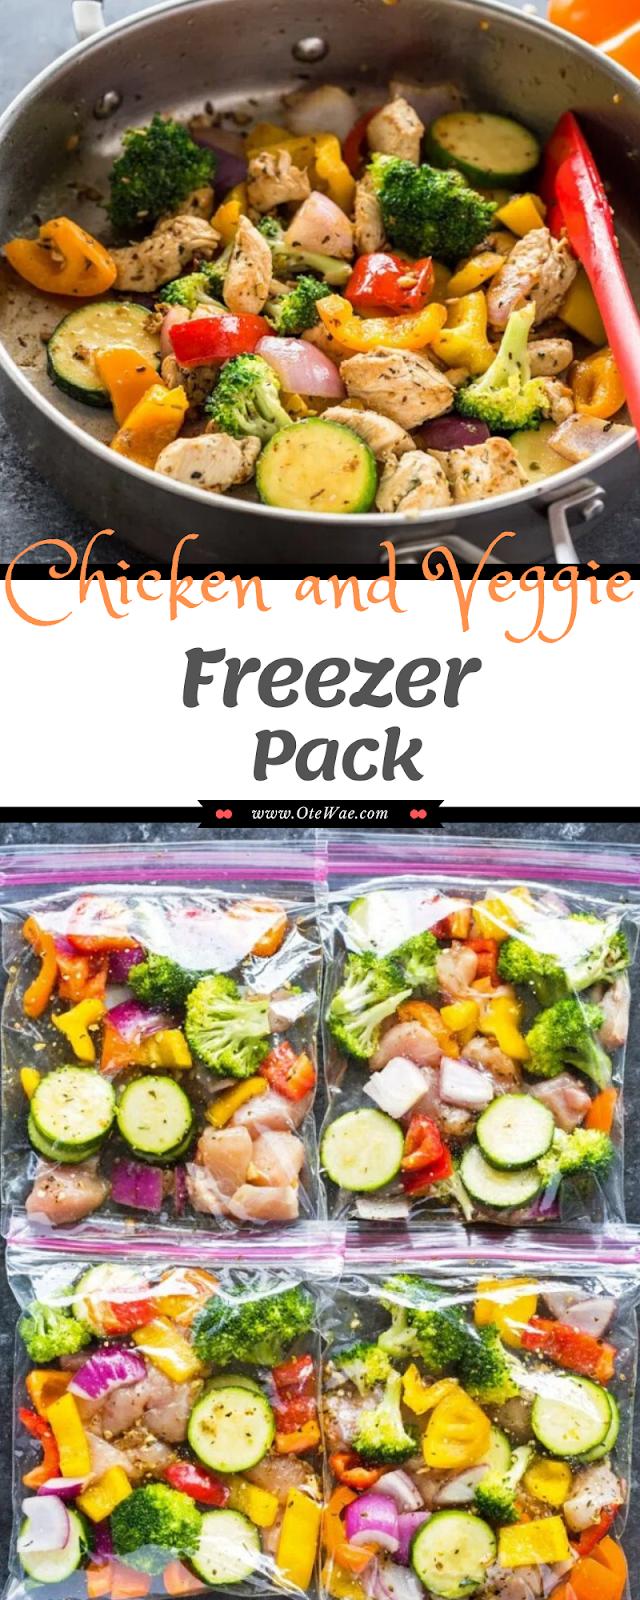 Chicken and Veggie Freezer Pack